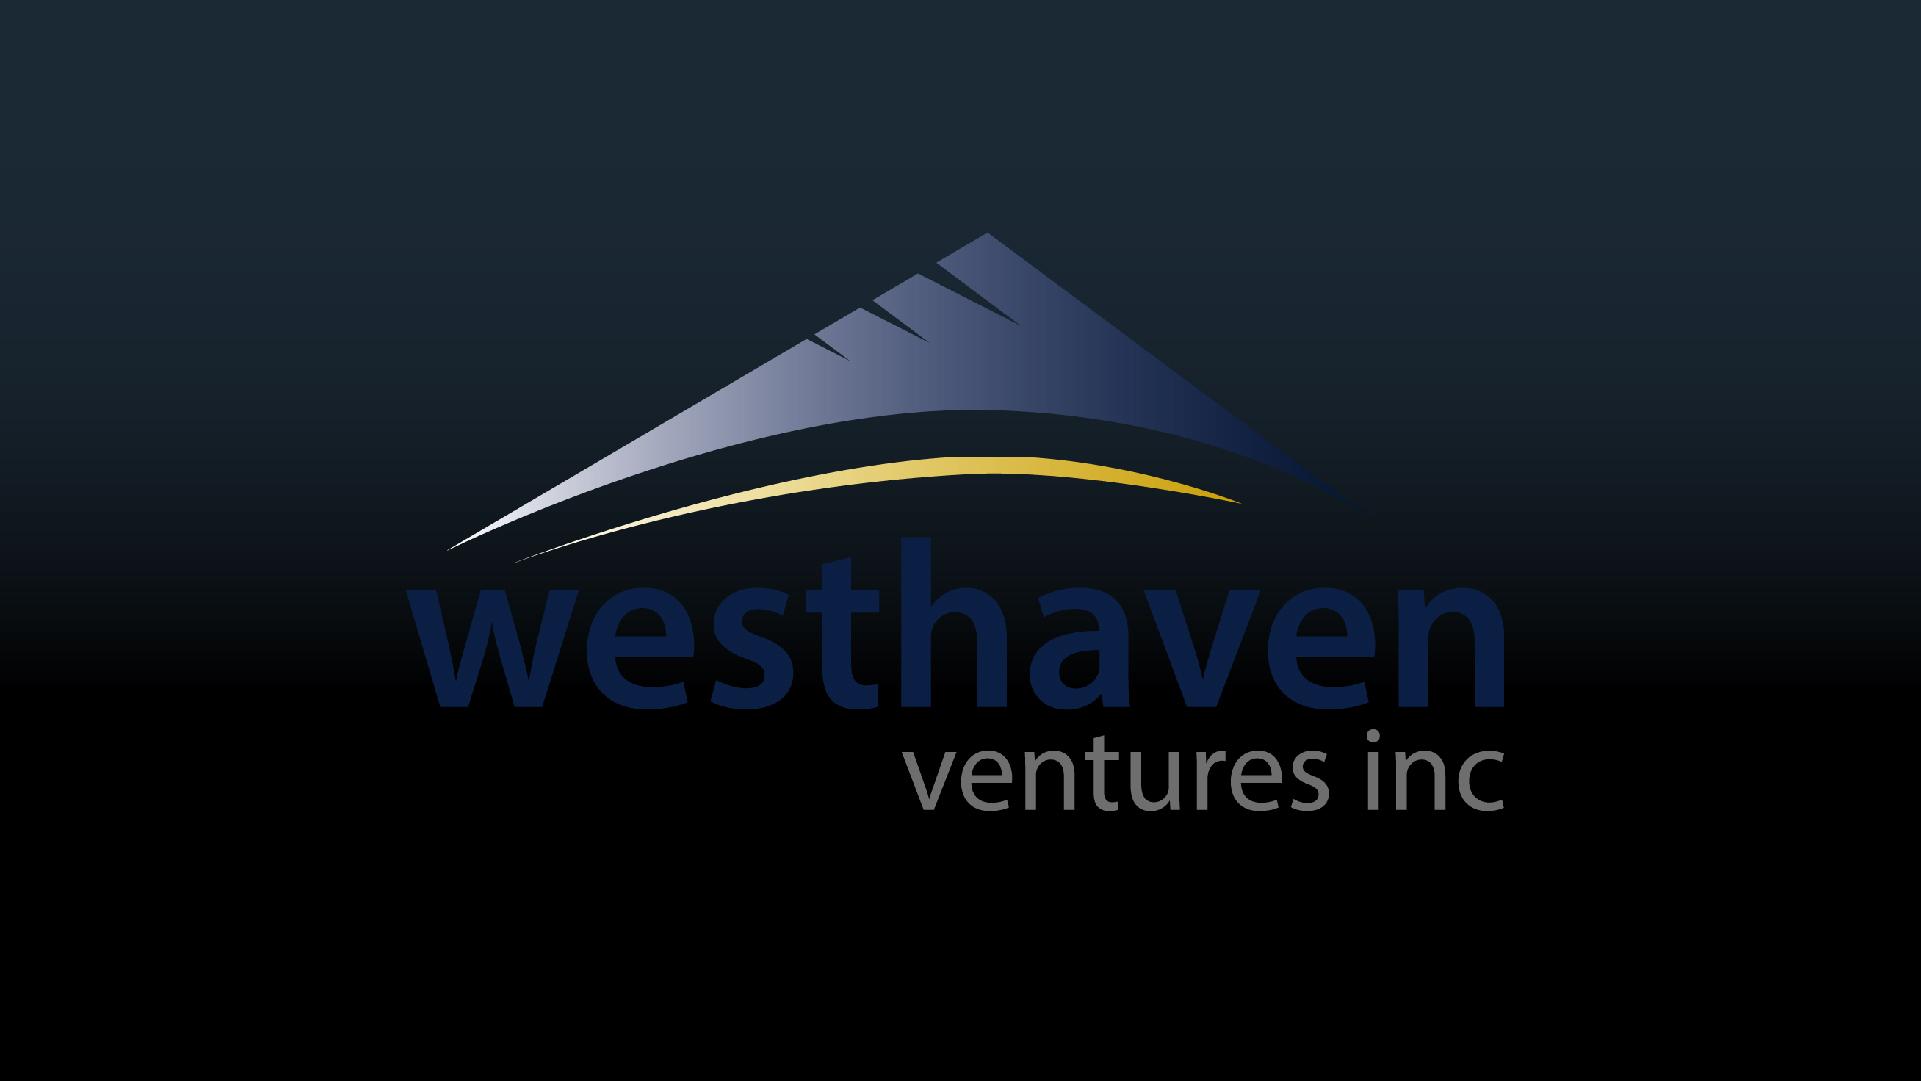 Westhaven Ventures Inc  (TSXV: WHN) - 2019 TSX Venture 50